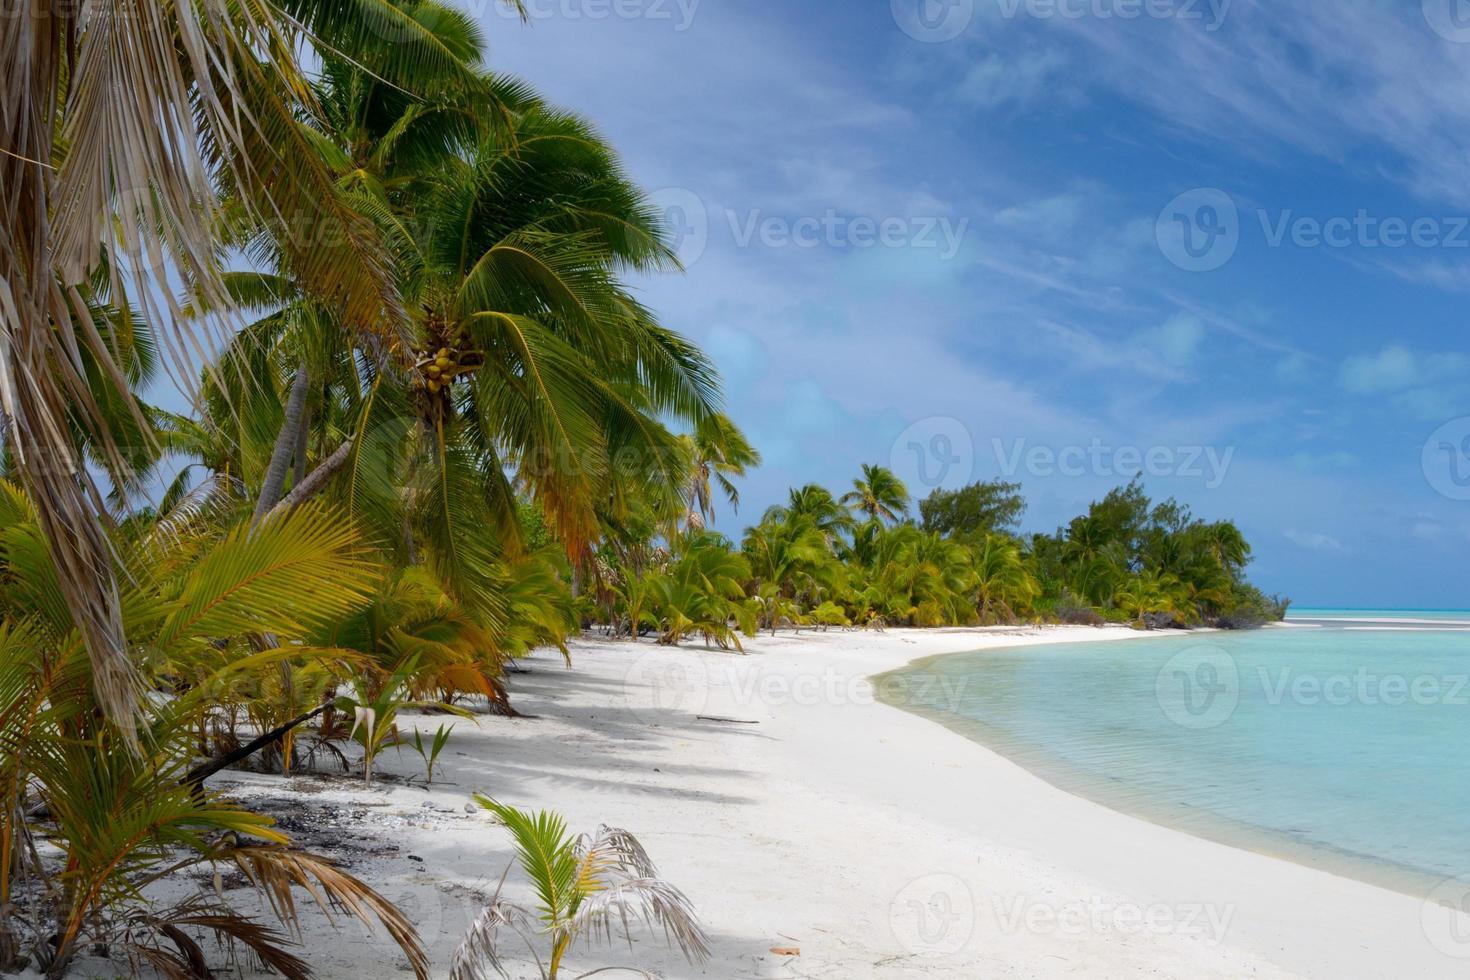 Desert beach on a remote island photo